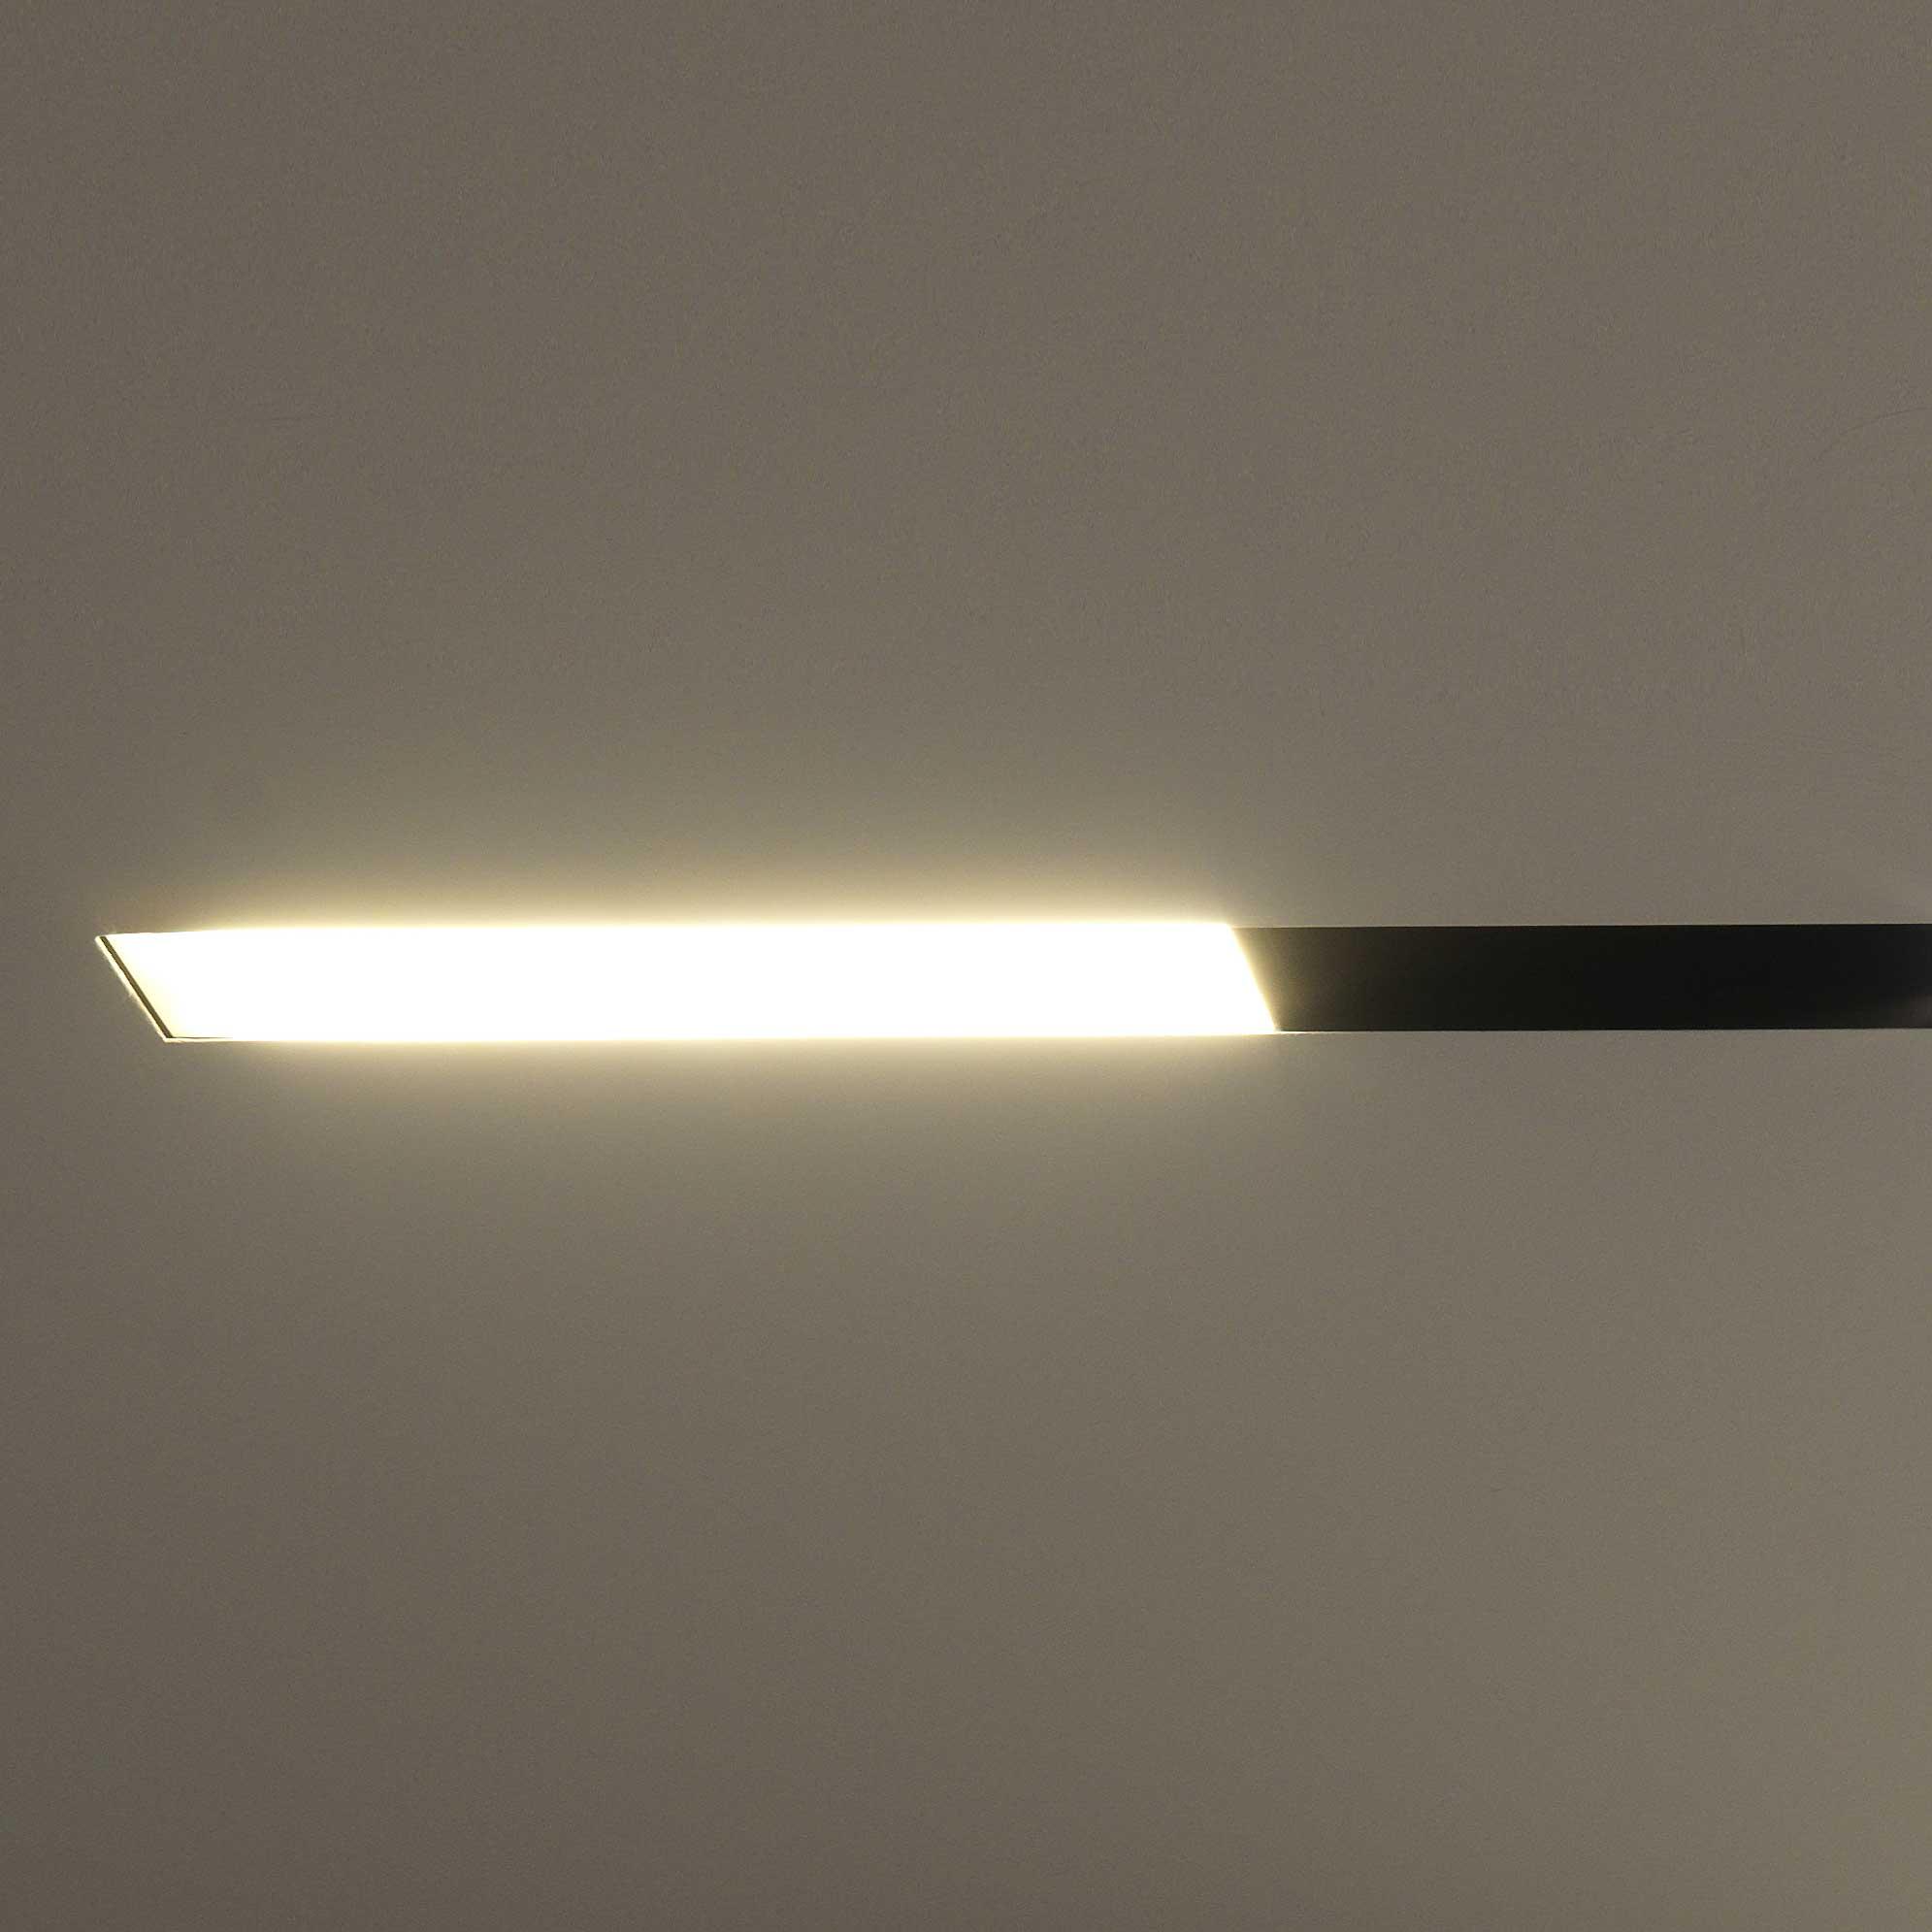 Ben Diffuser ModuleDarklight Led Maggy Flexalighting 72 TcK3l1JF